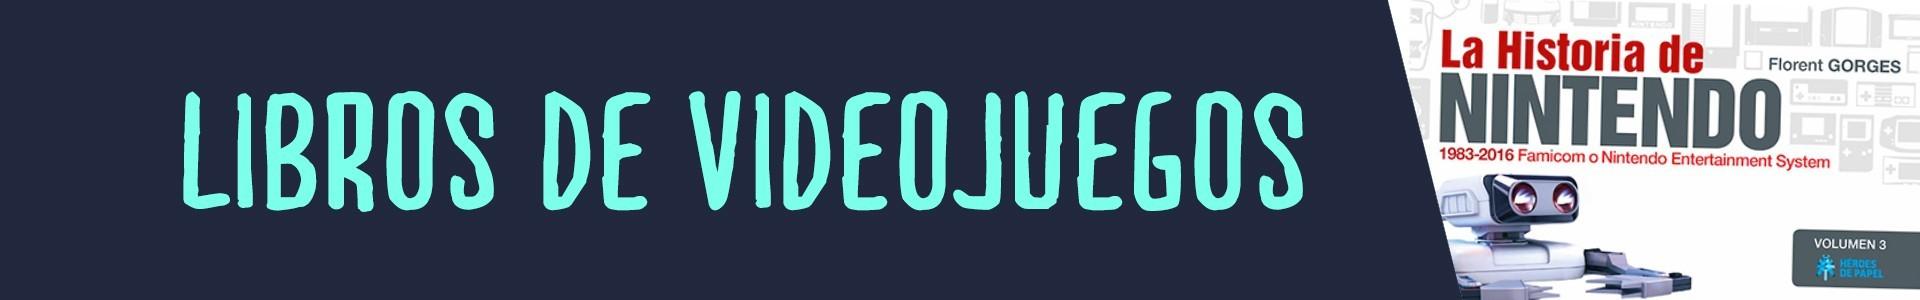 Libros de Videojuegos